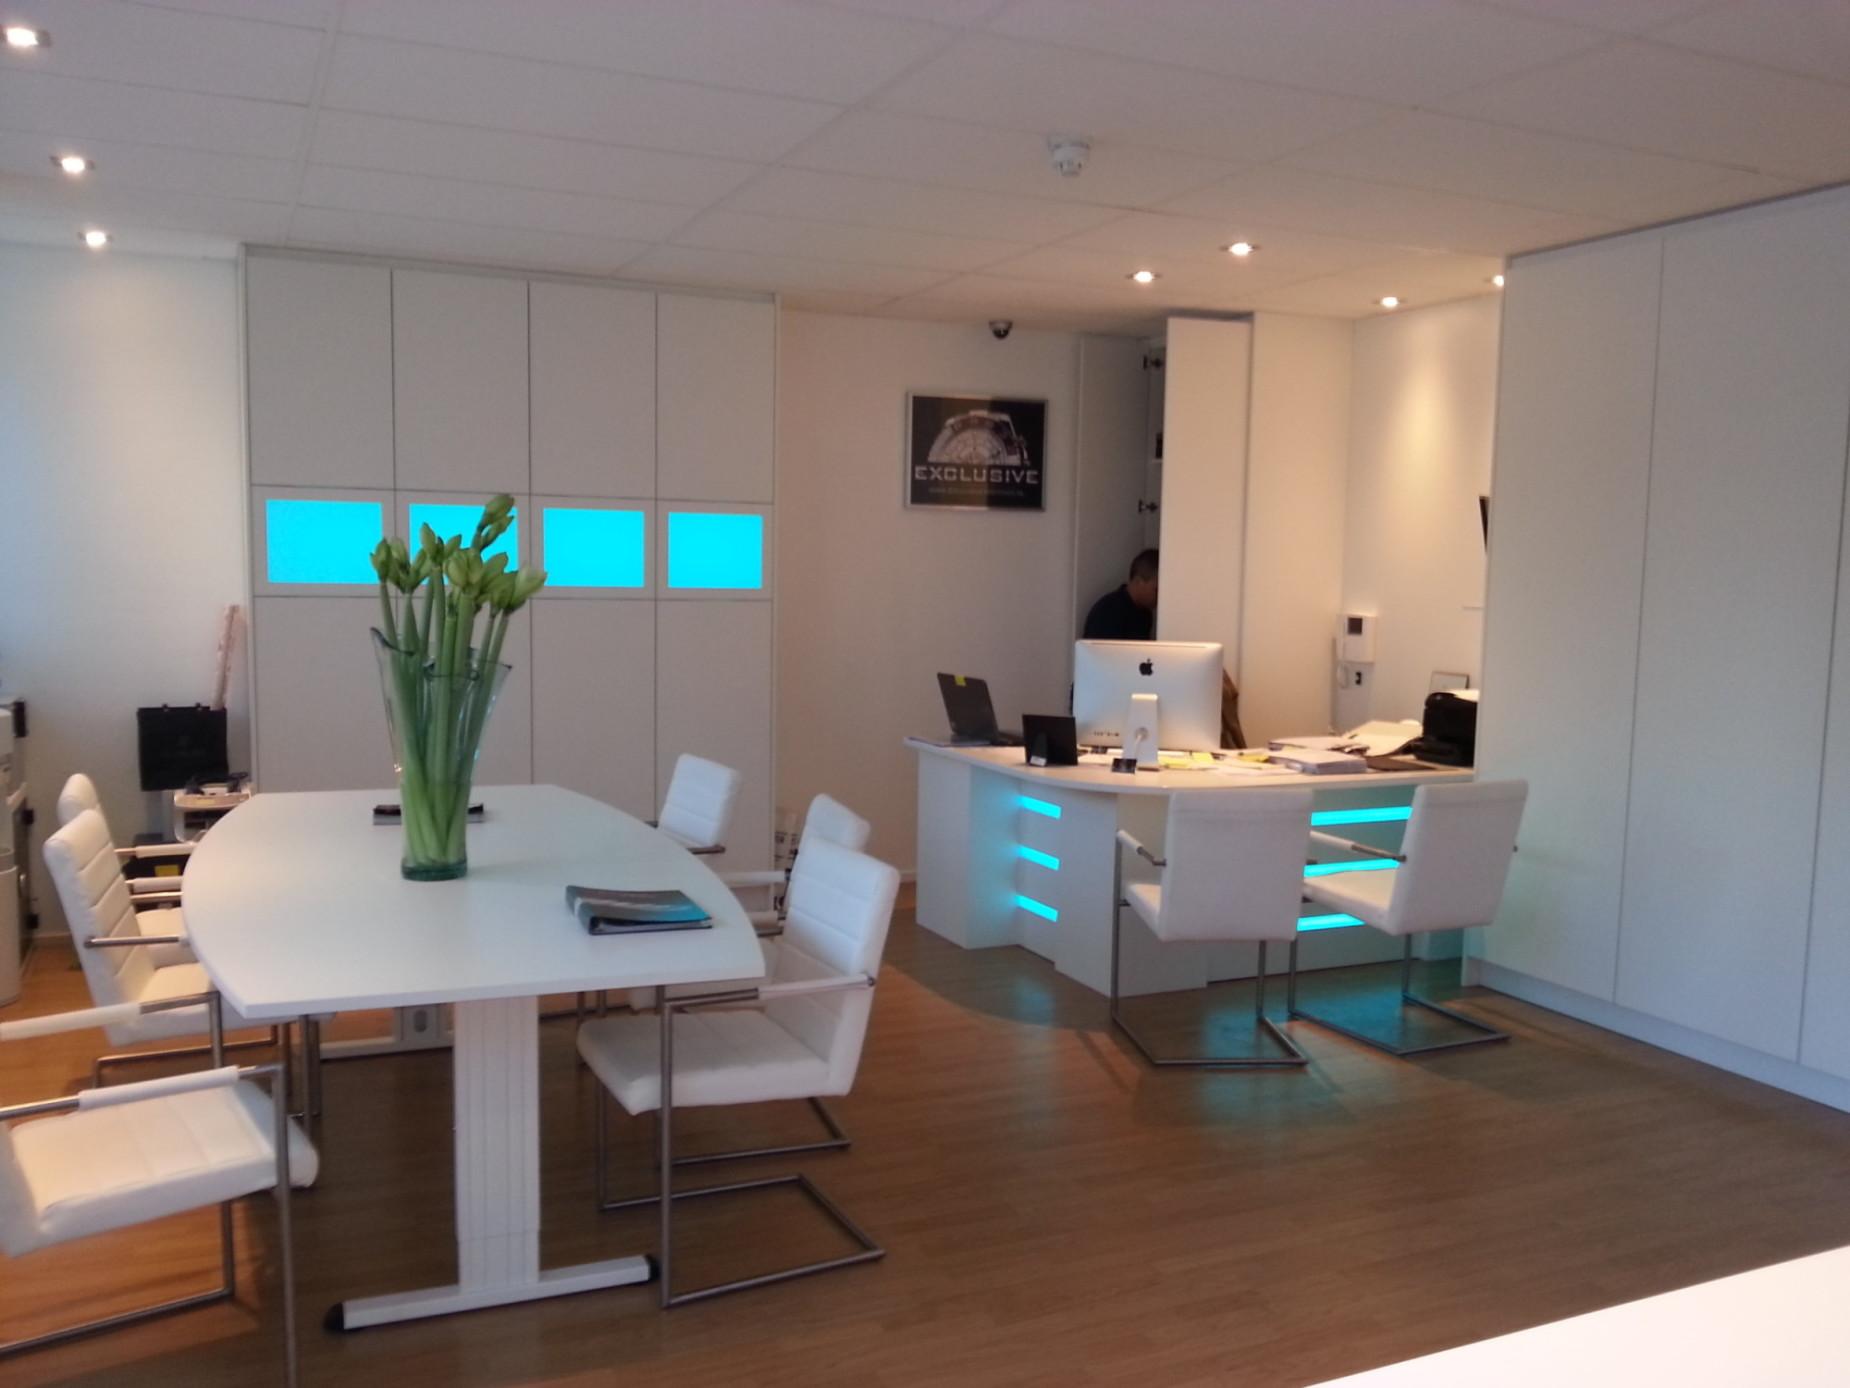 Kantoor inrichting rimo interieurdesign - Moderne kantoorbureaus ...